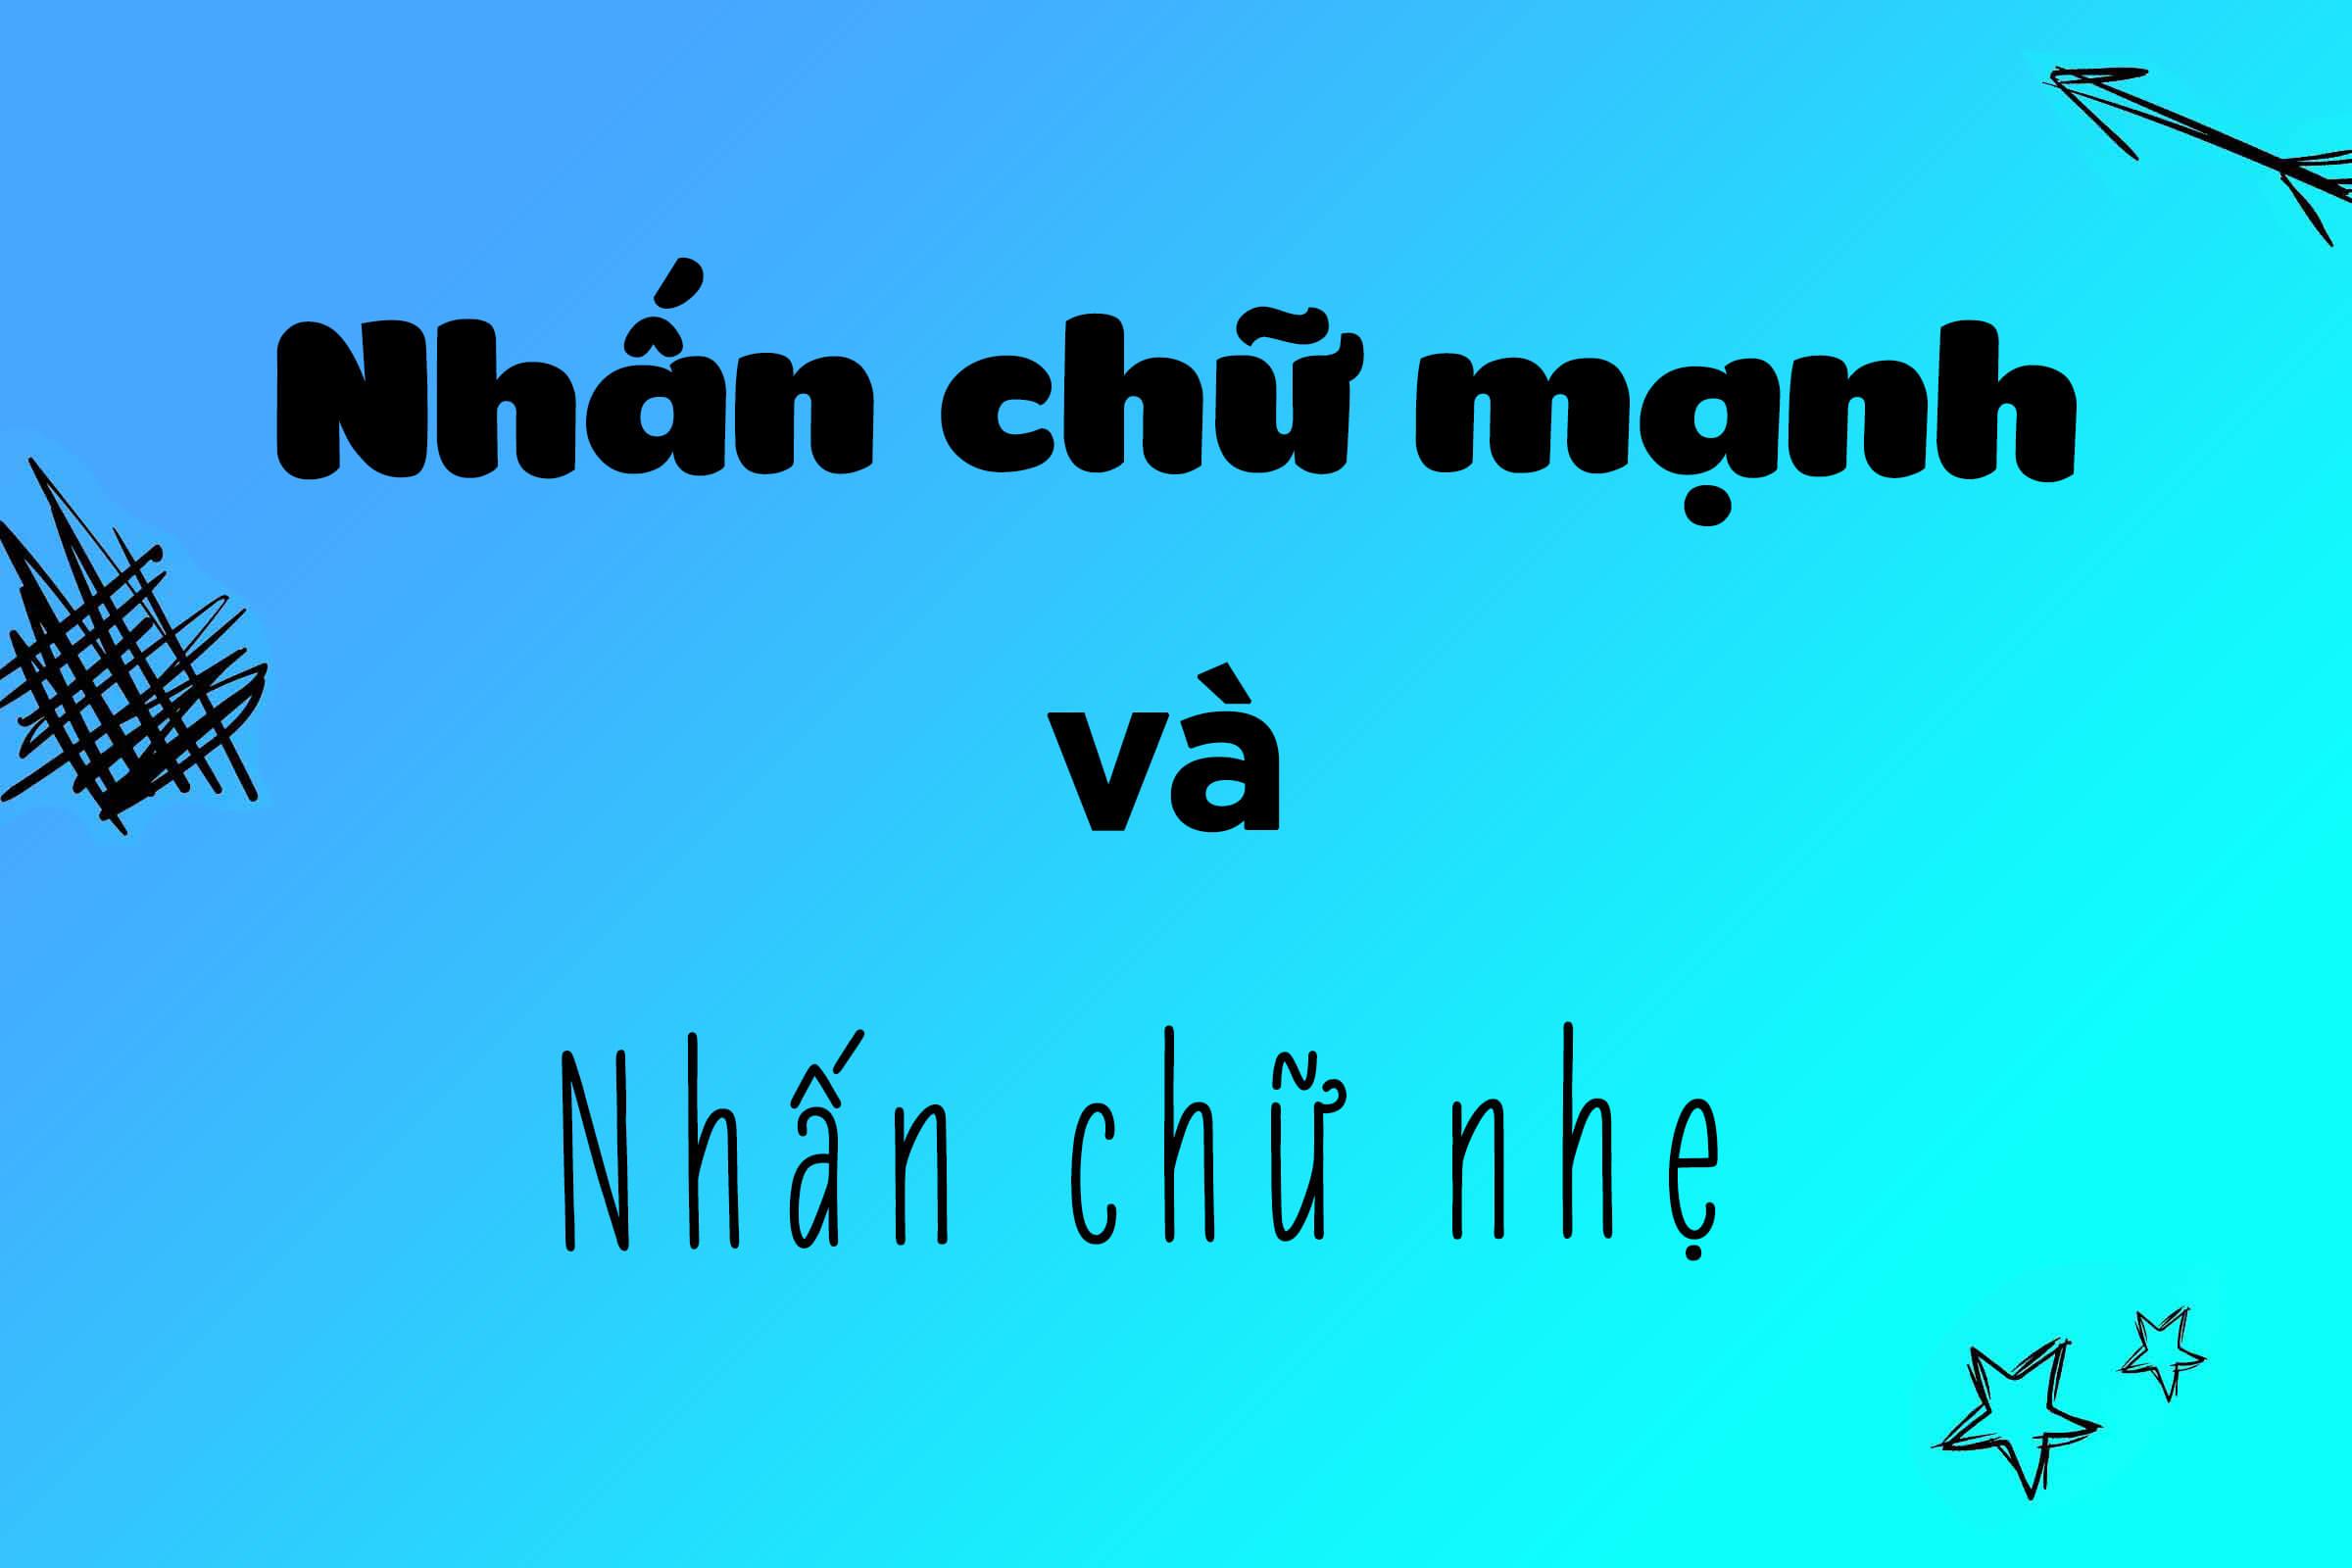 nhin-chu-doan-tinh-cach-huong-di-moi-giup-sep-doc-vi-nhan-vien-4